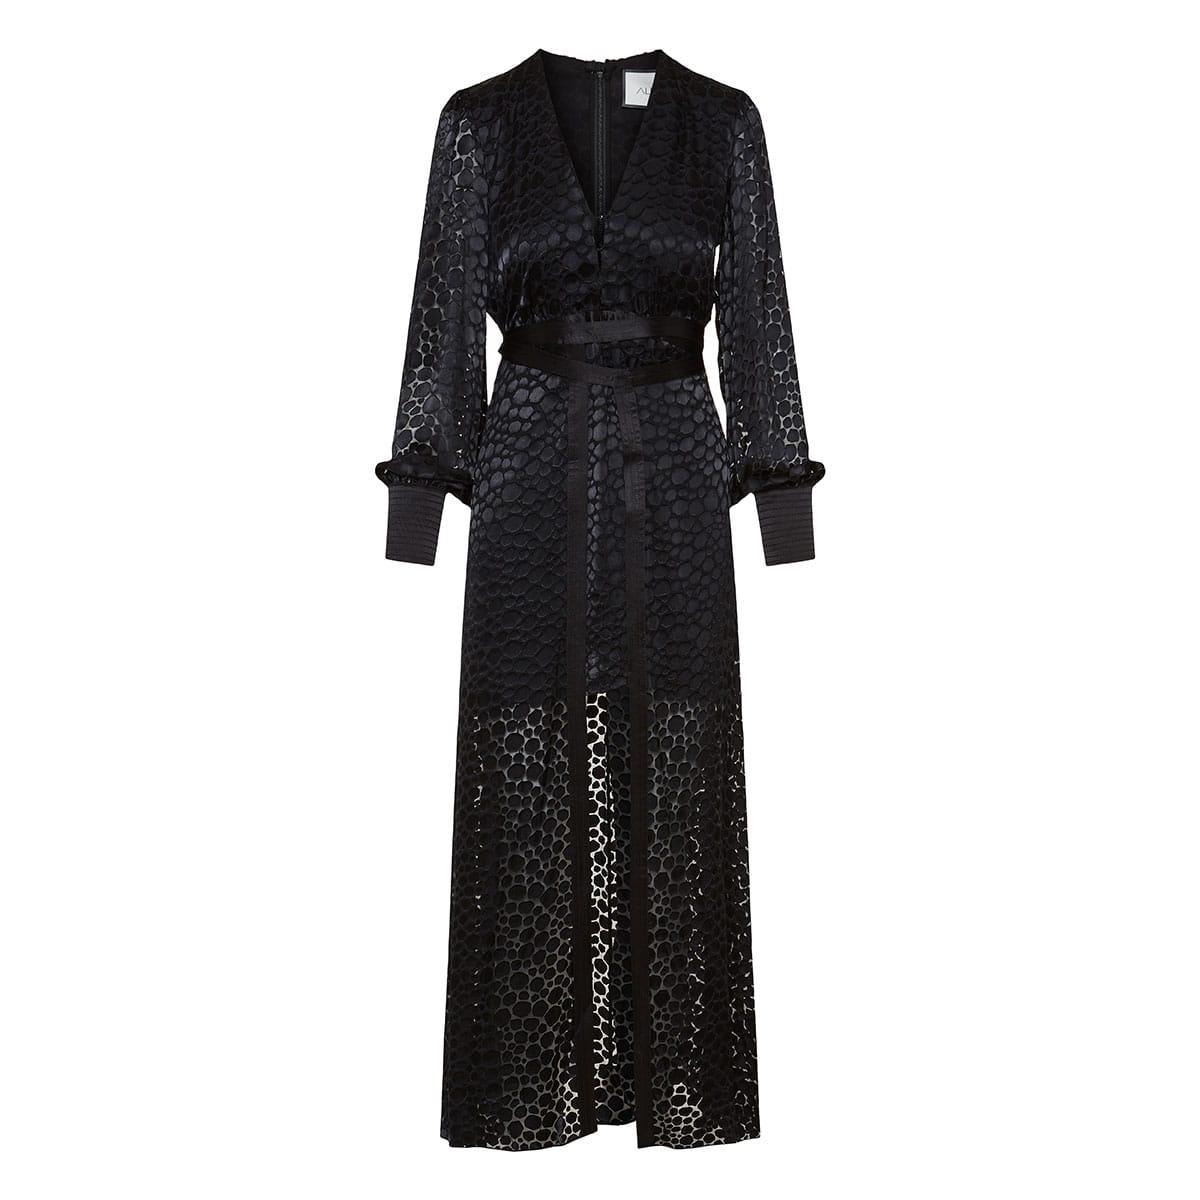 Cordelia long textured dress